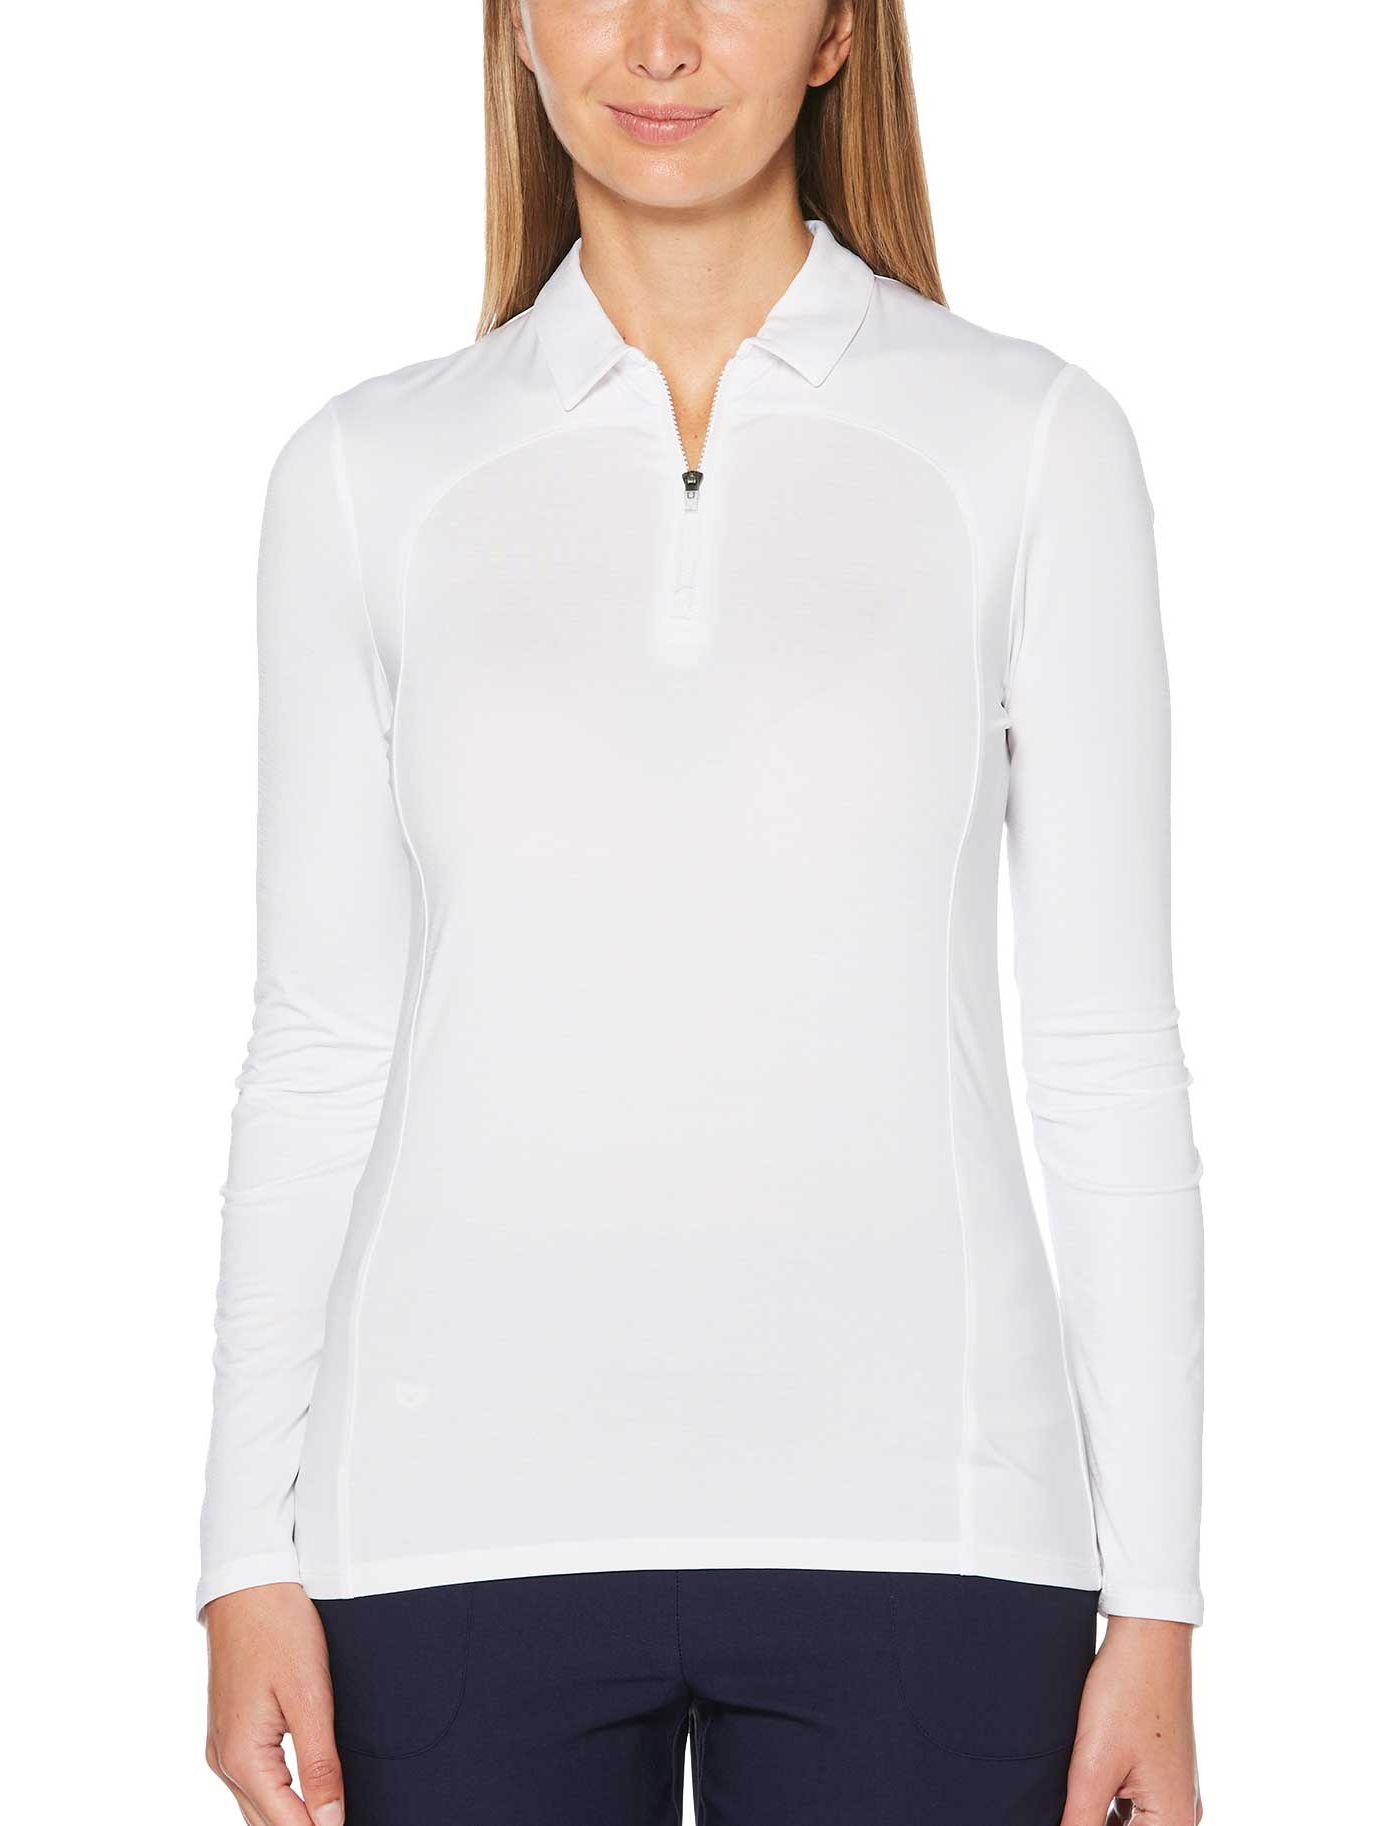 Callaway Women's ¼-Zip Long Sleeve Golf Polo